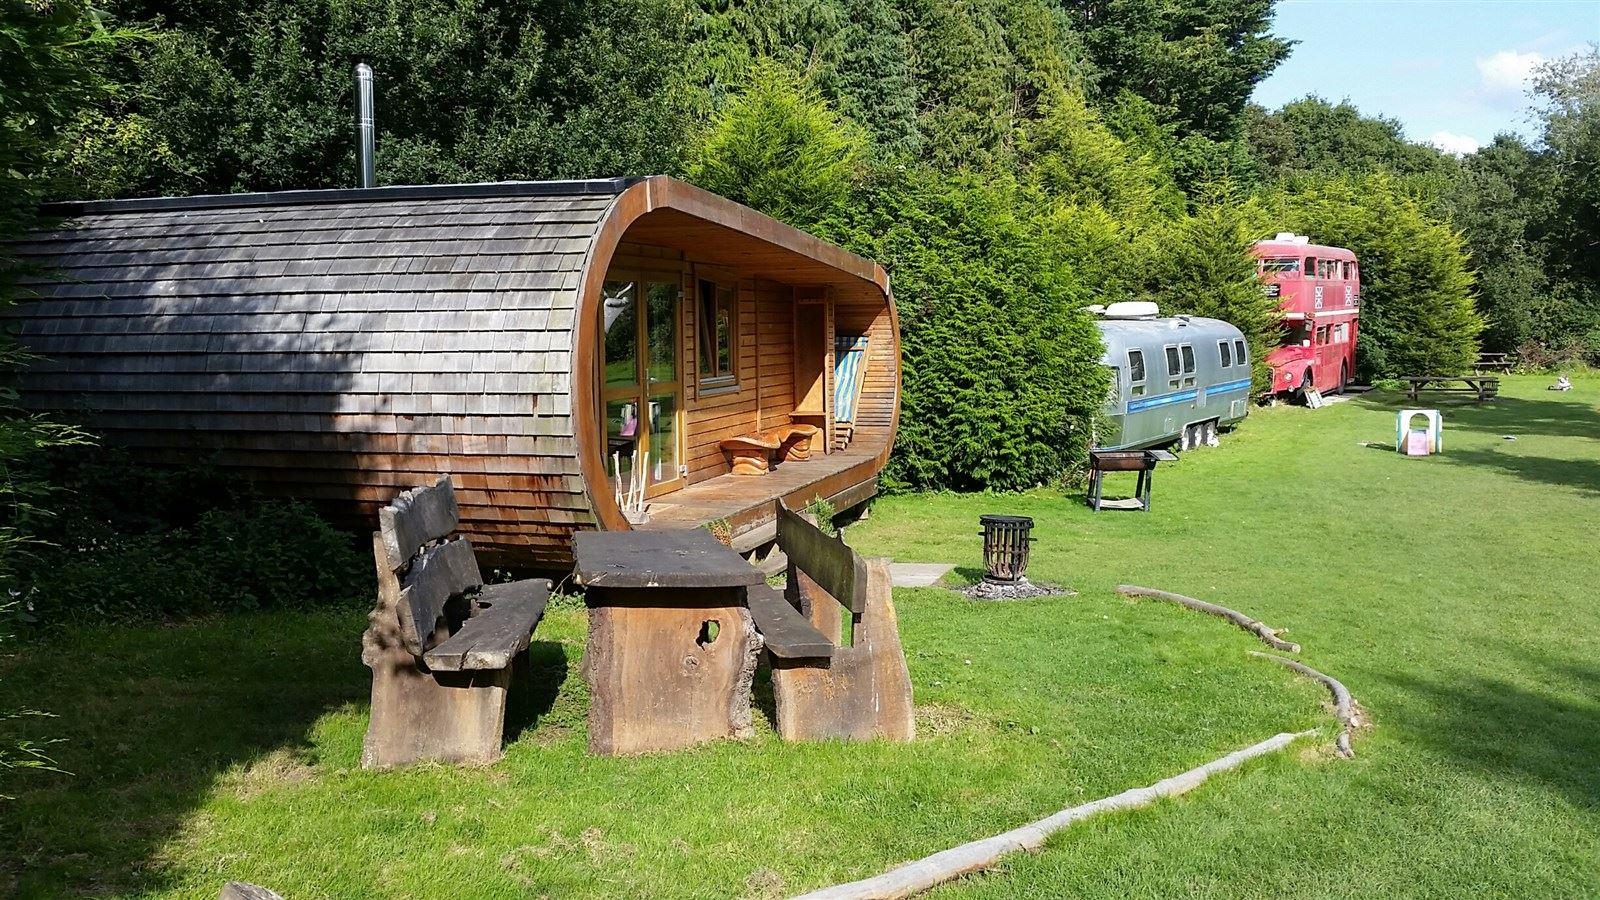 Blackberry Wood - - campsites.co.uk